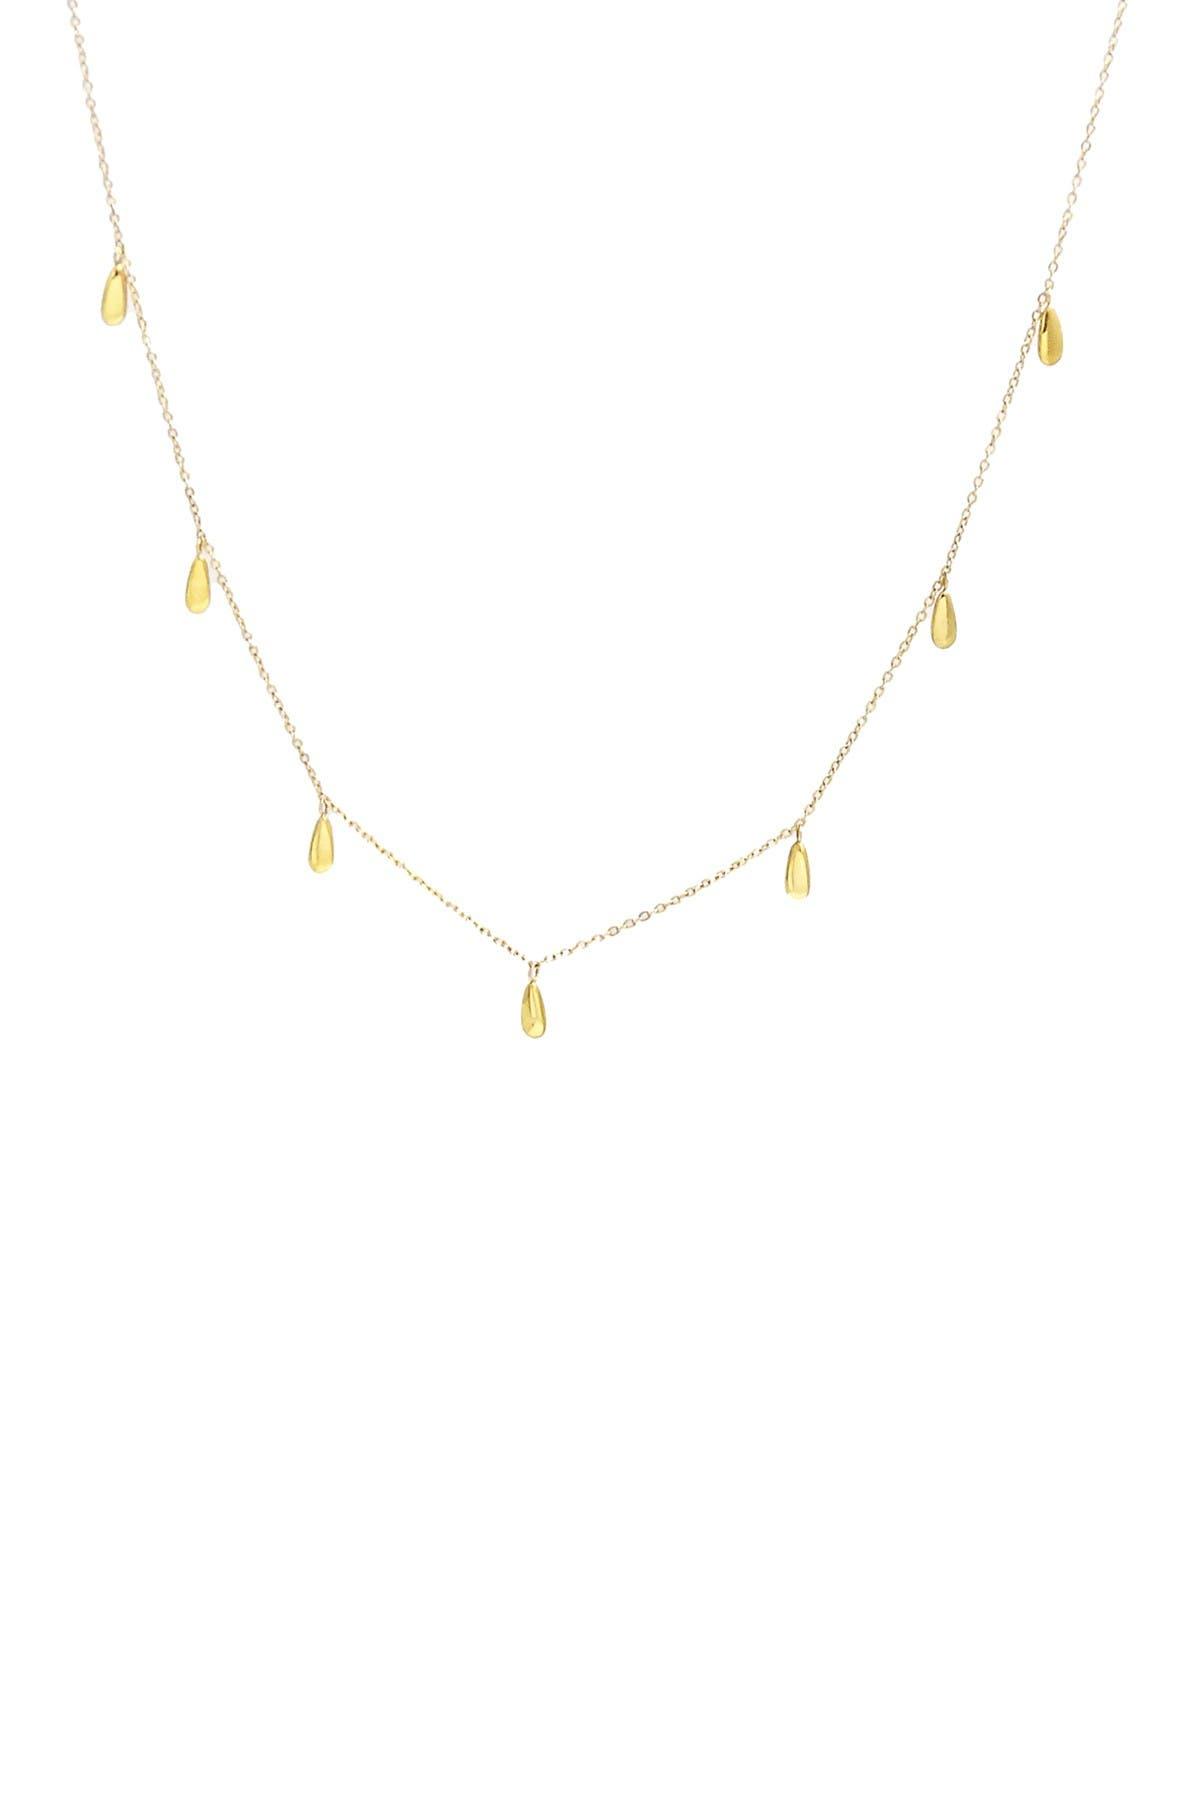 Image of Savvy Cie 18K Gold Plated Teardrop Choker Necklace